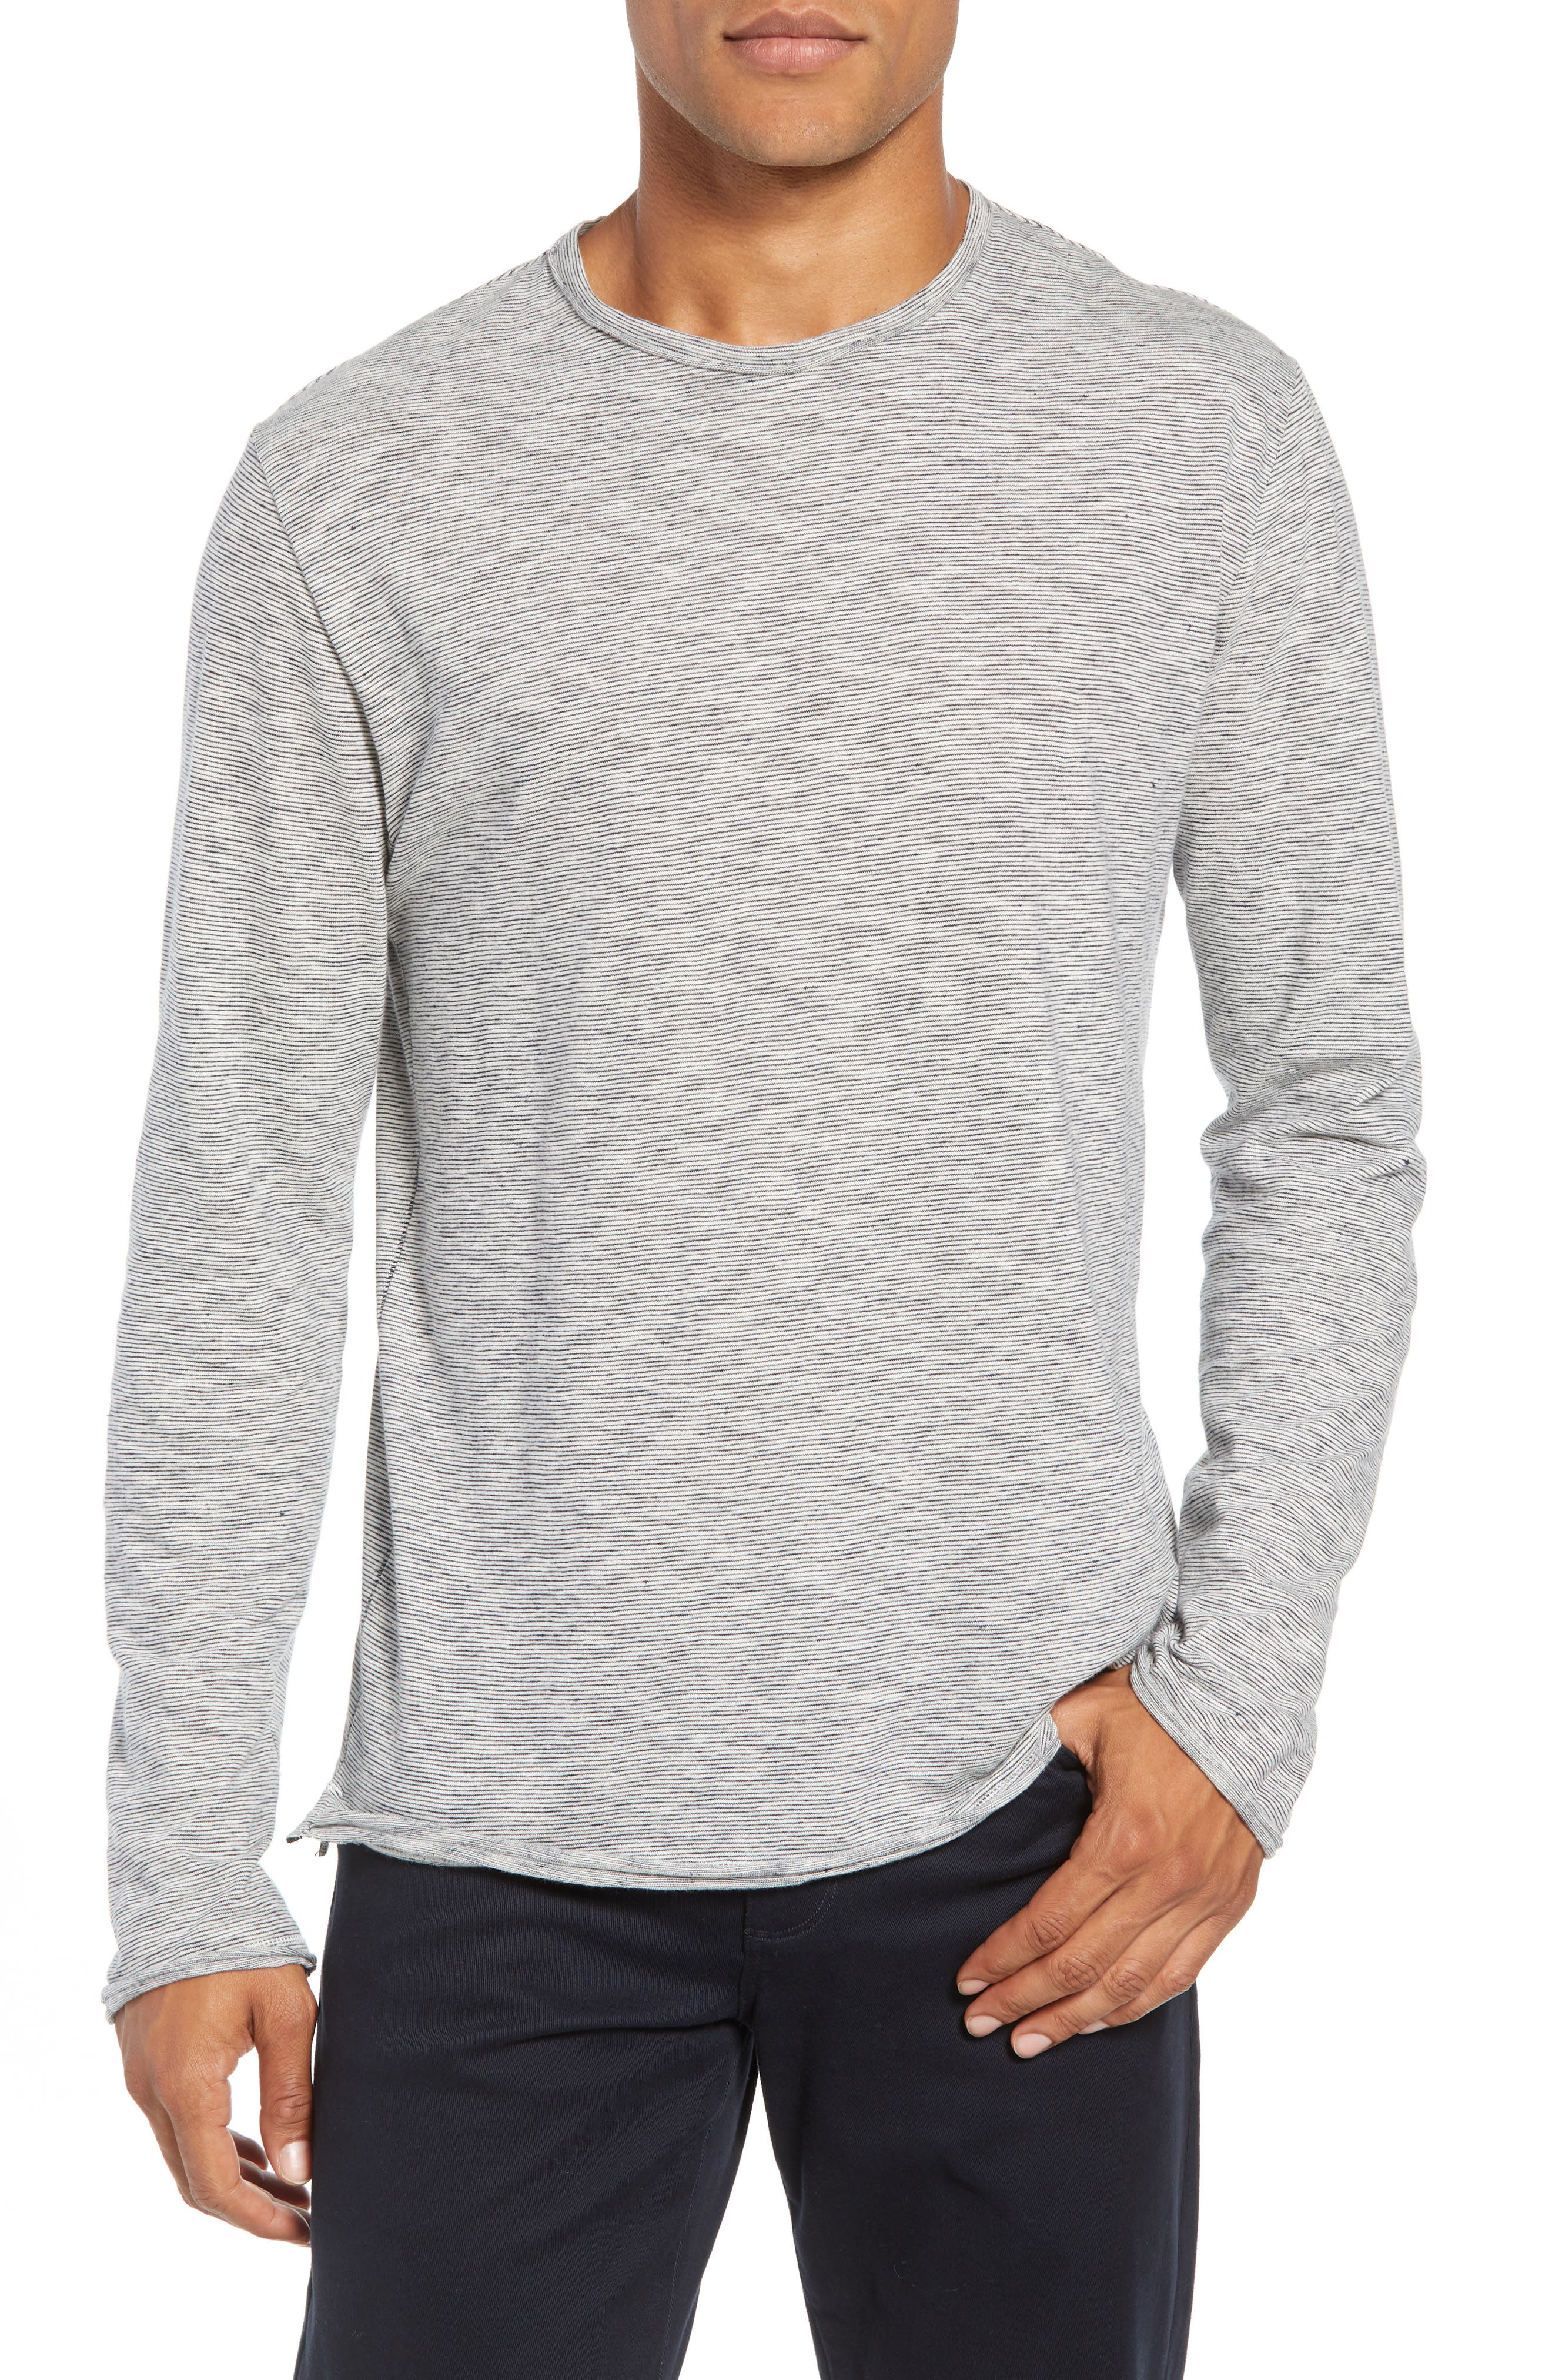 Owen T-Shirt,                             Main thumbnail 1, color,                             NAVY/ WHITE